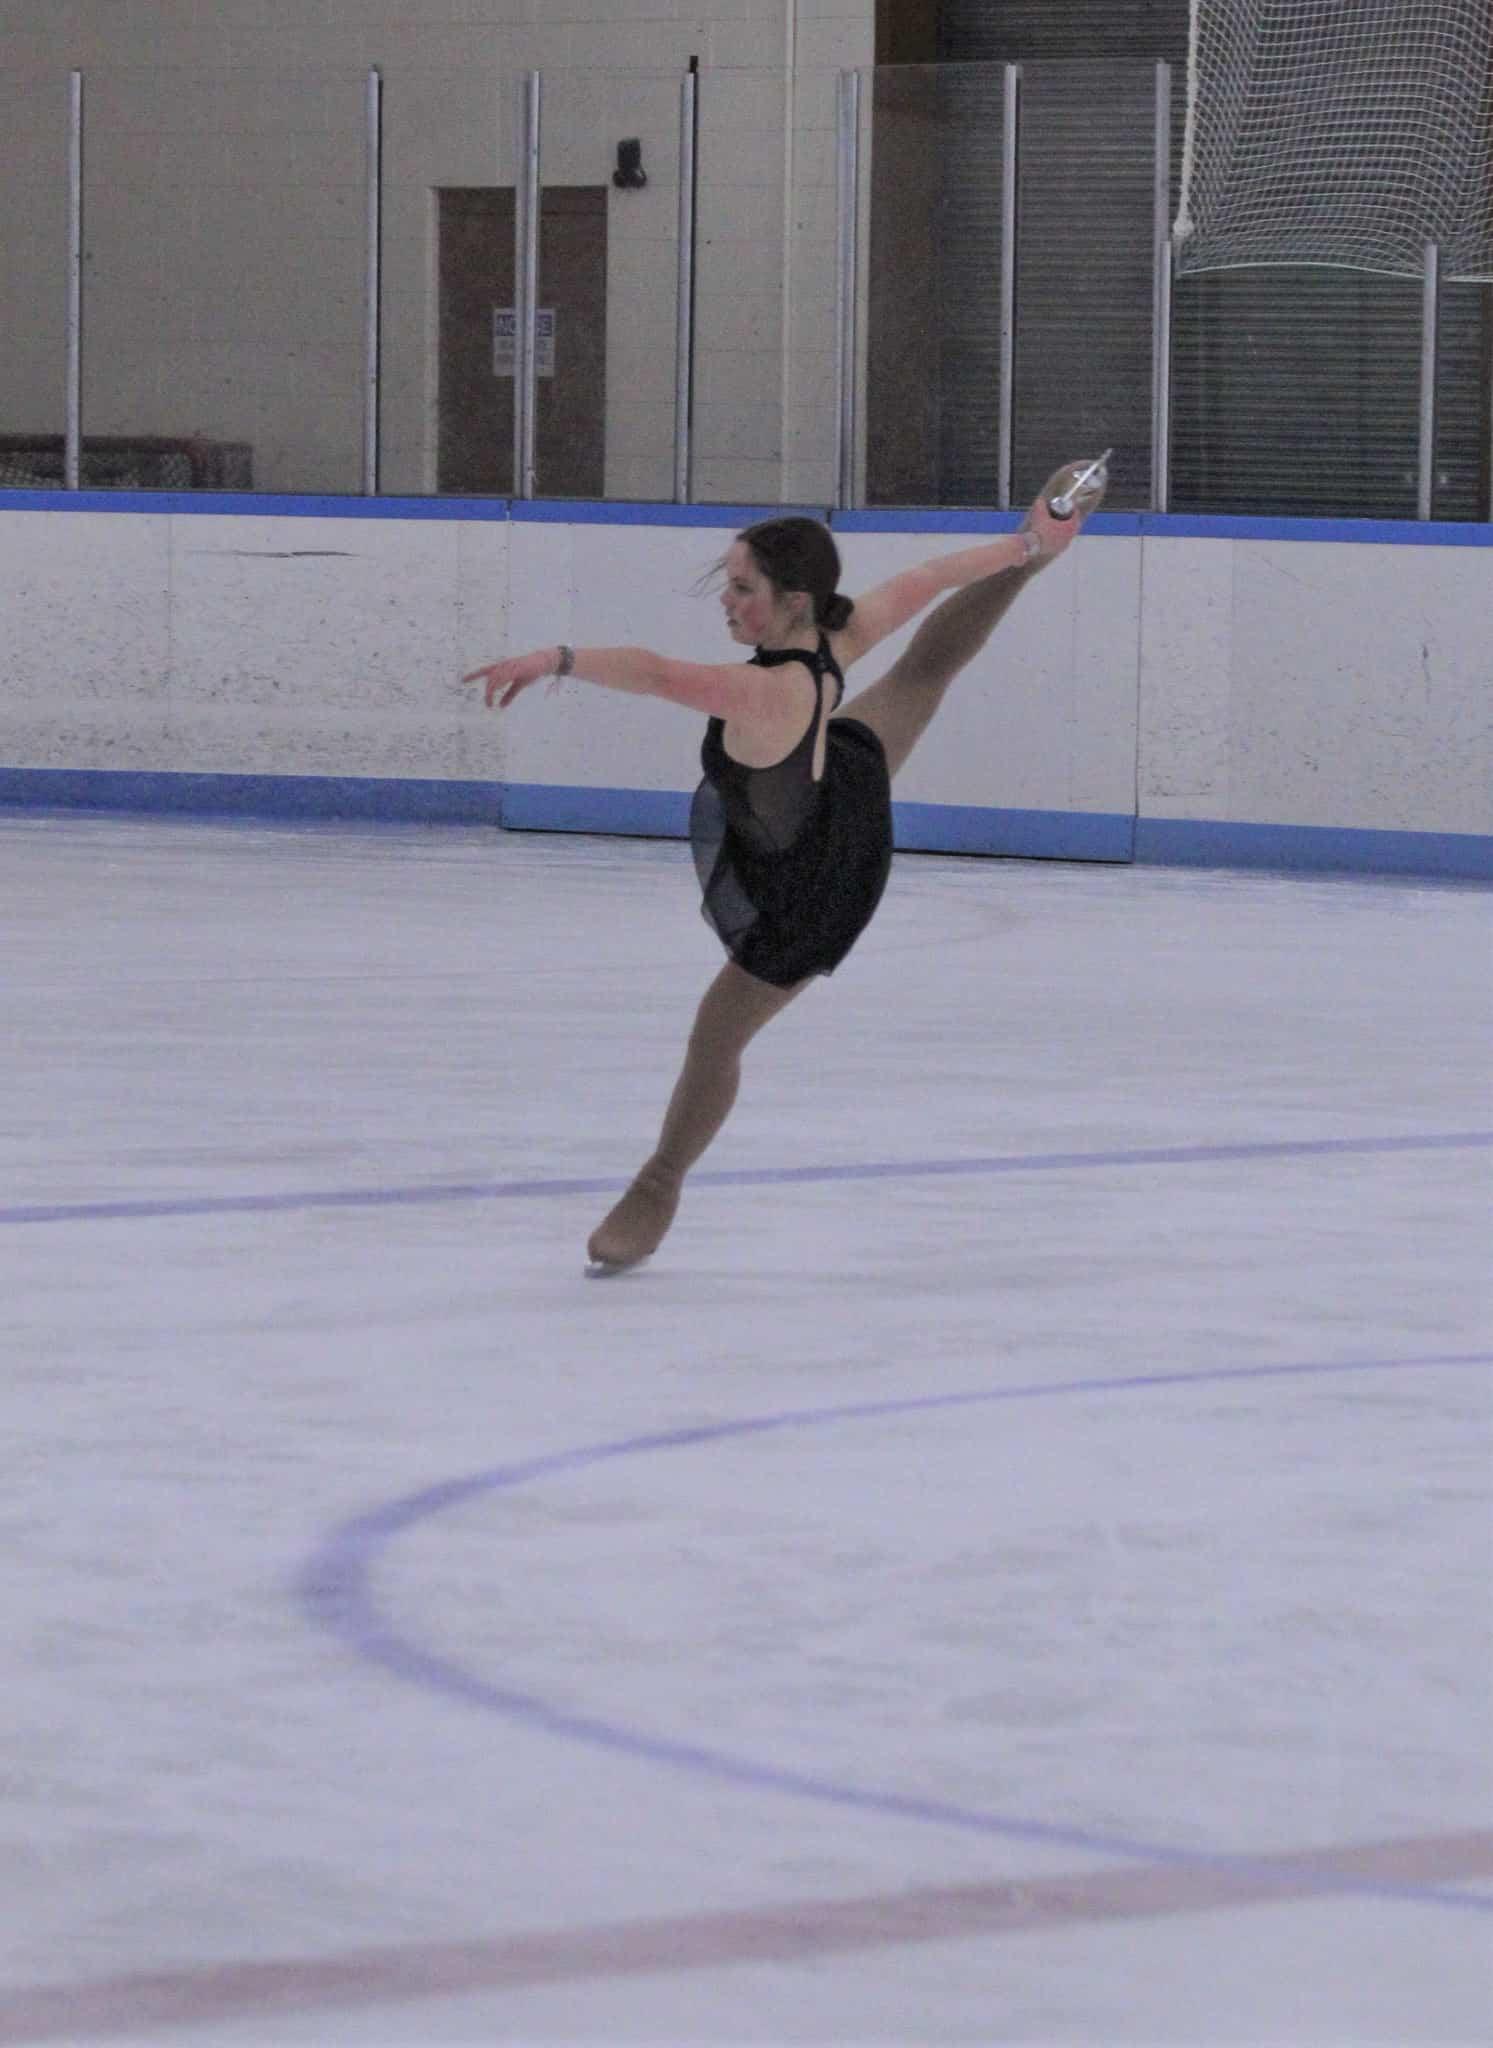 20210401-last skate 3c